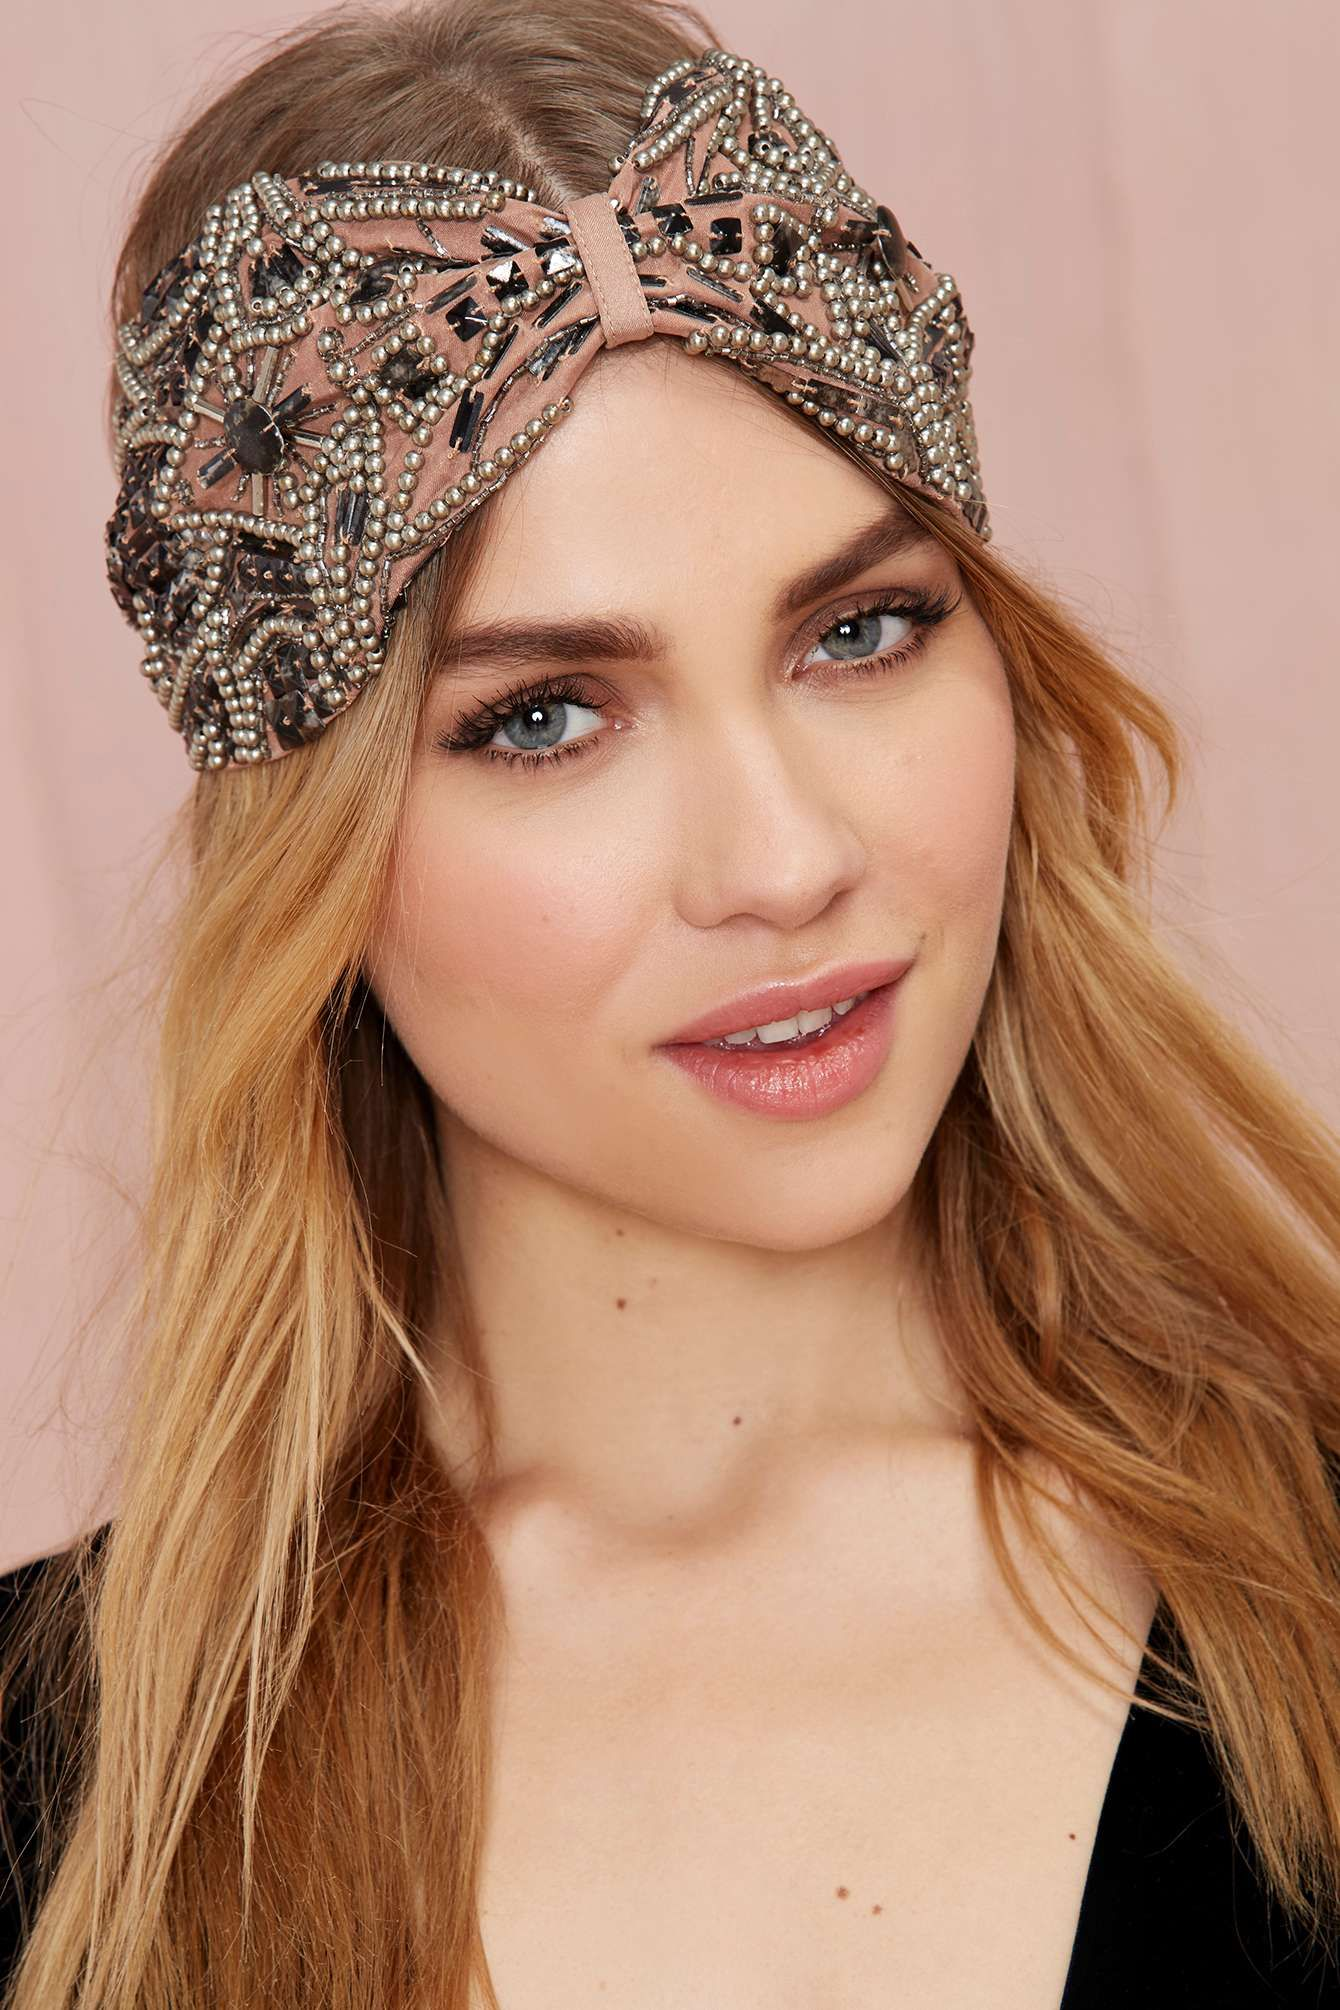 Eliza Beaded Headband Thanks It S New Headbands Accessories